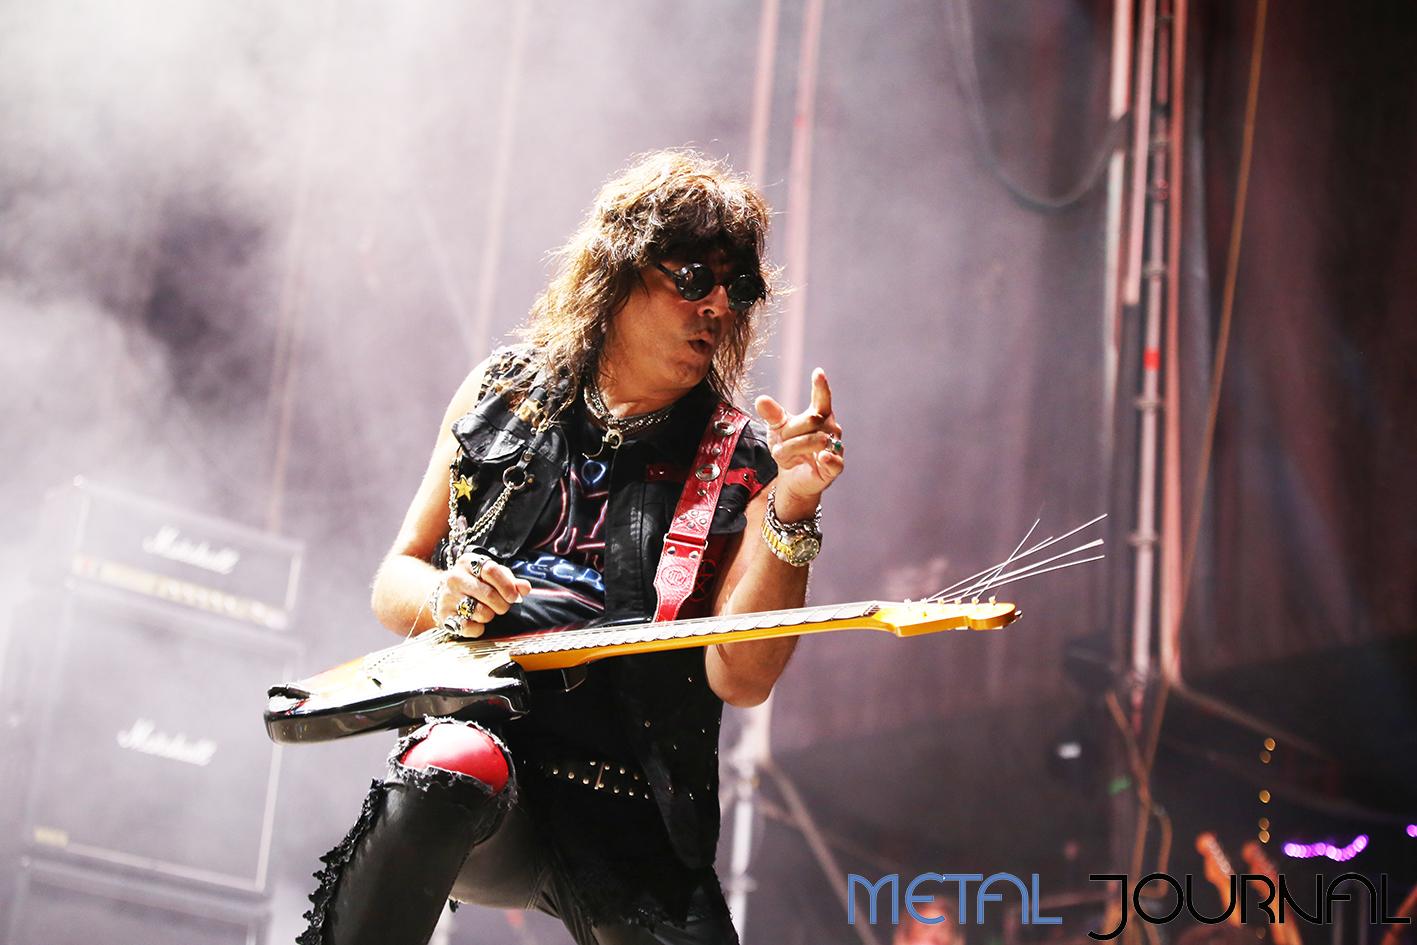 rata blanca - leyendas del rock 2019 metal journal pic 10